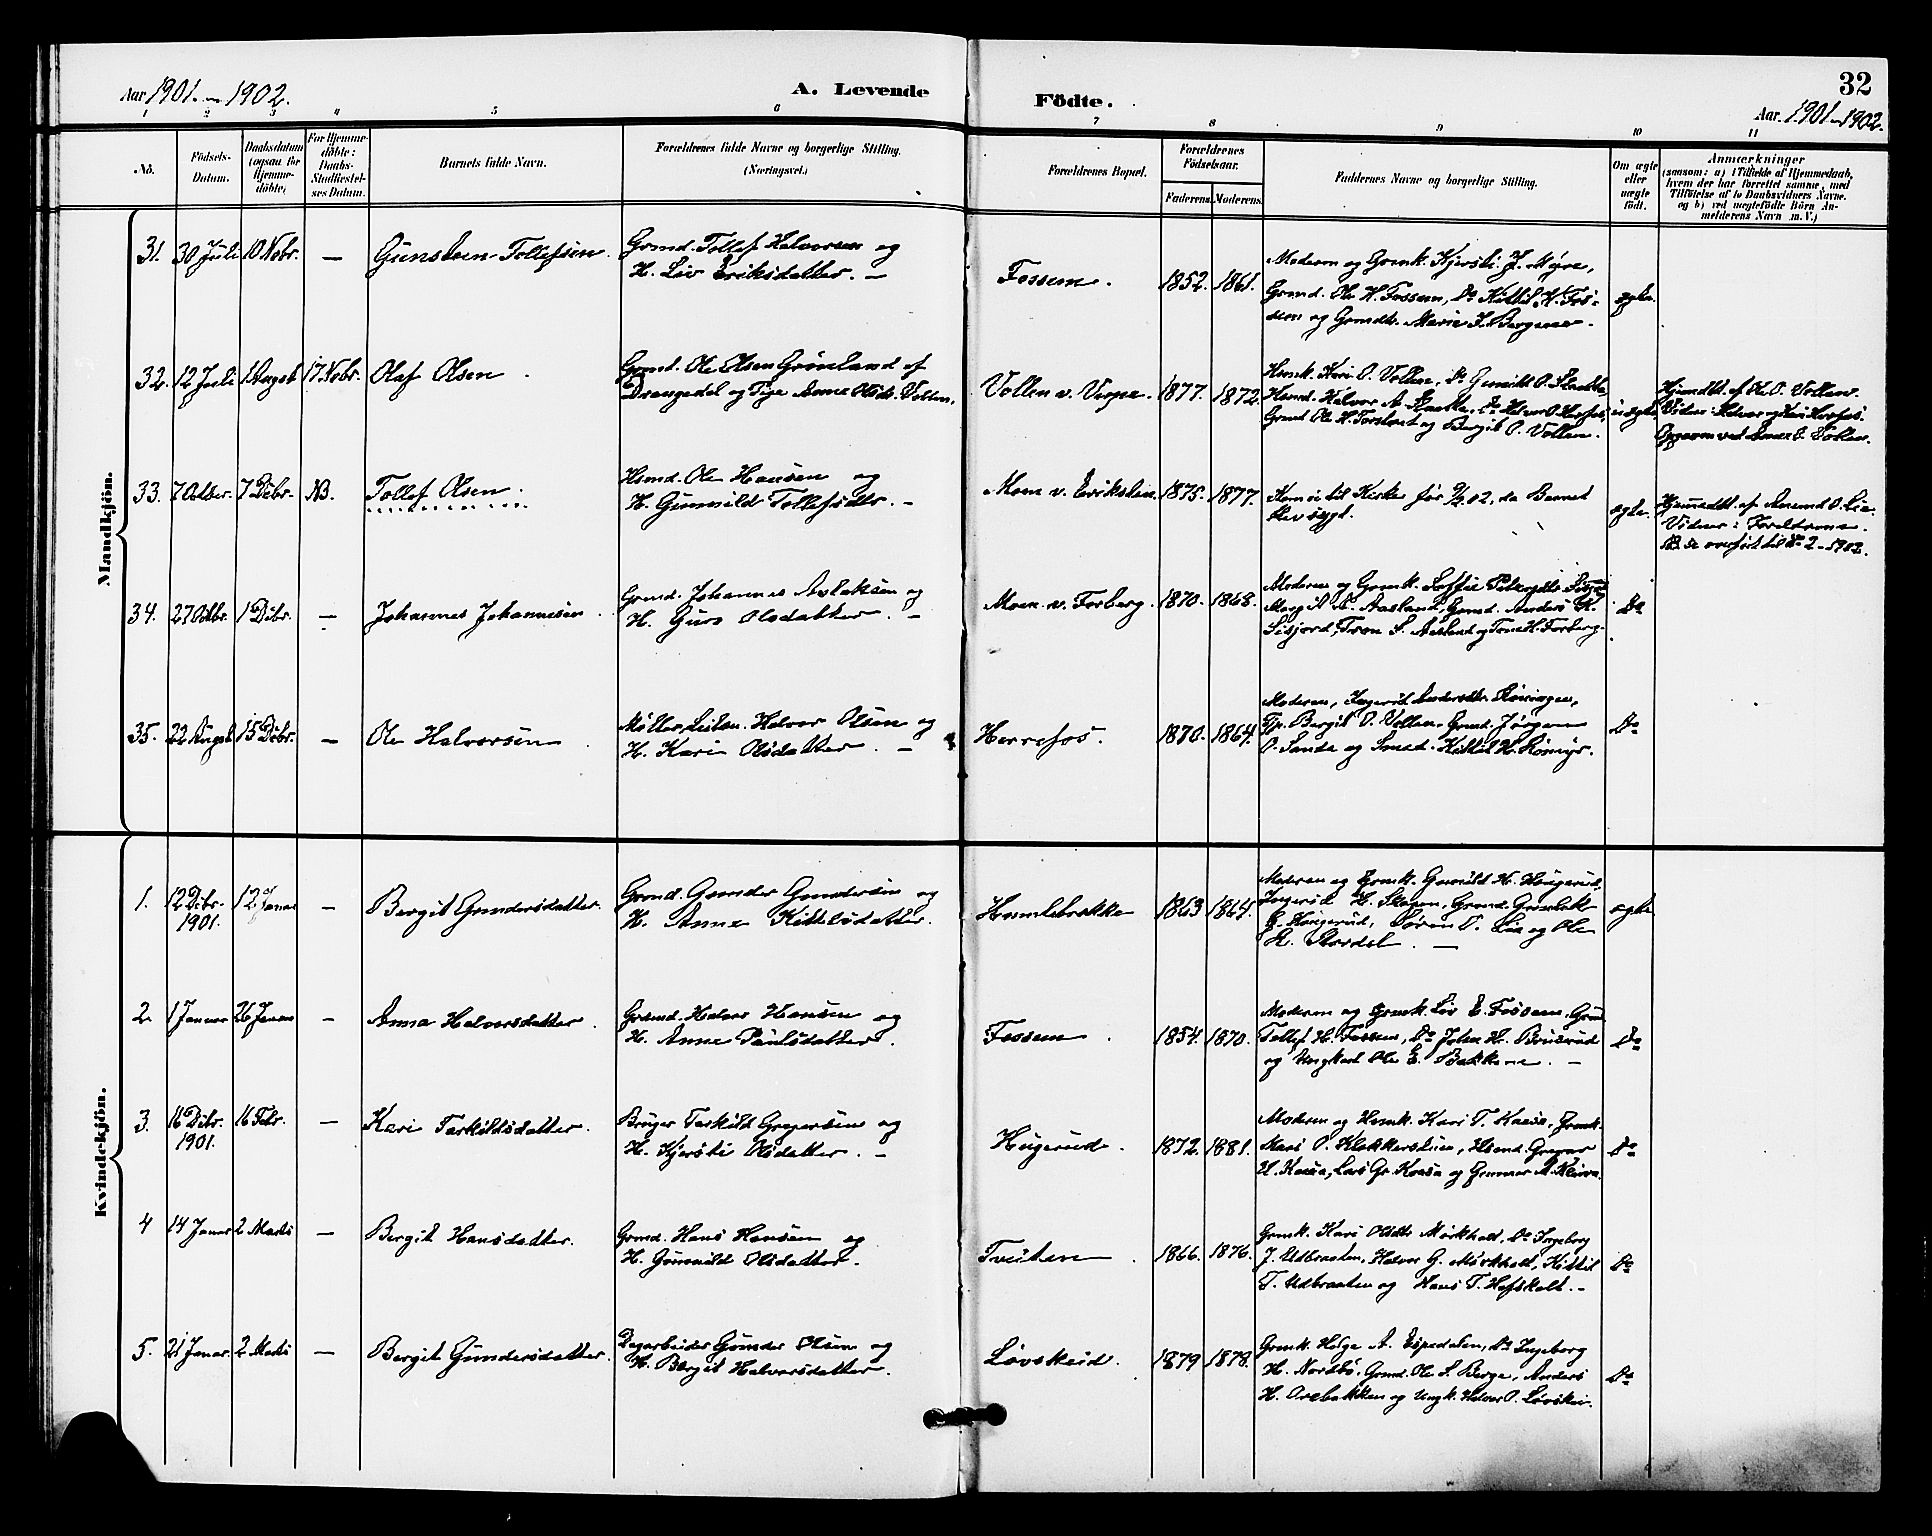 SAKO, Bø kirkebøker, G/Ga/L0006: Klokkerbok nr. 6, 1898-1909, s. 32